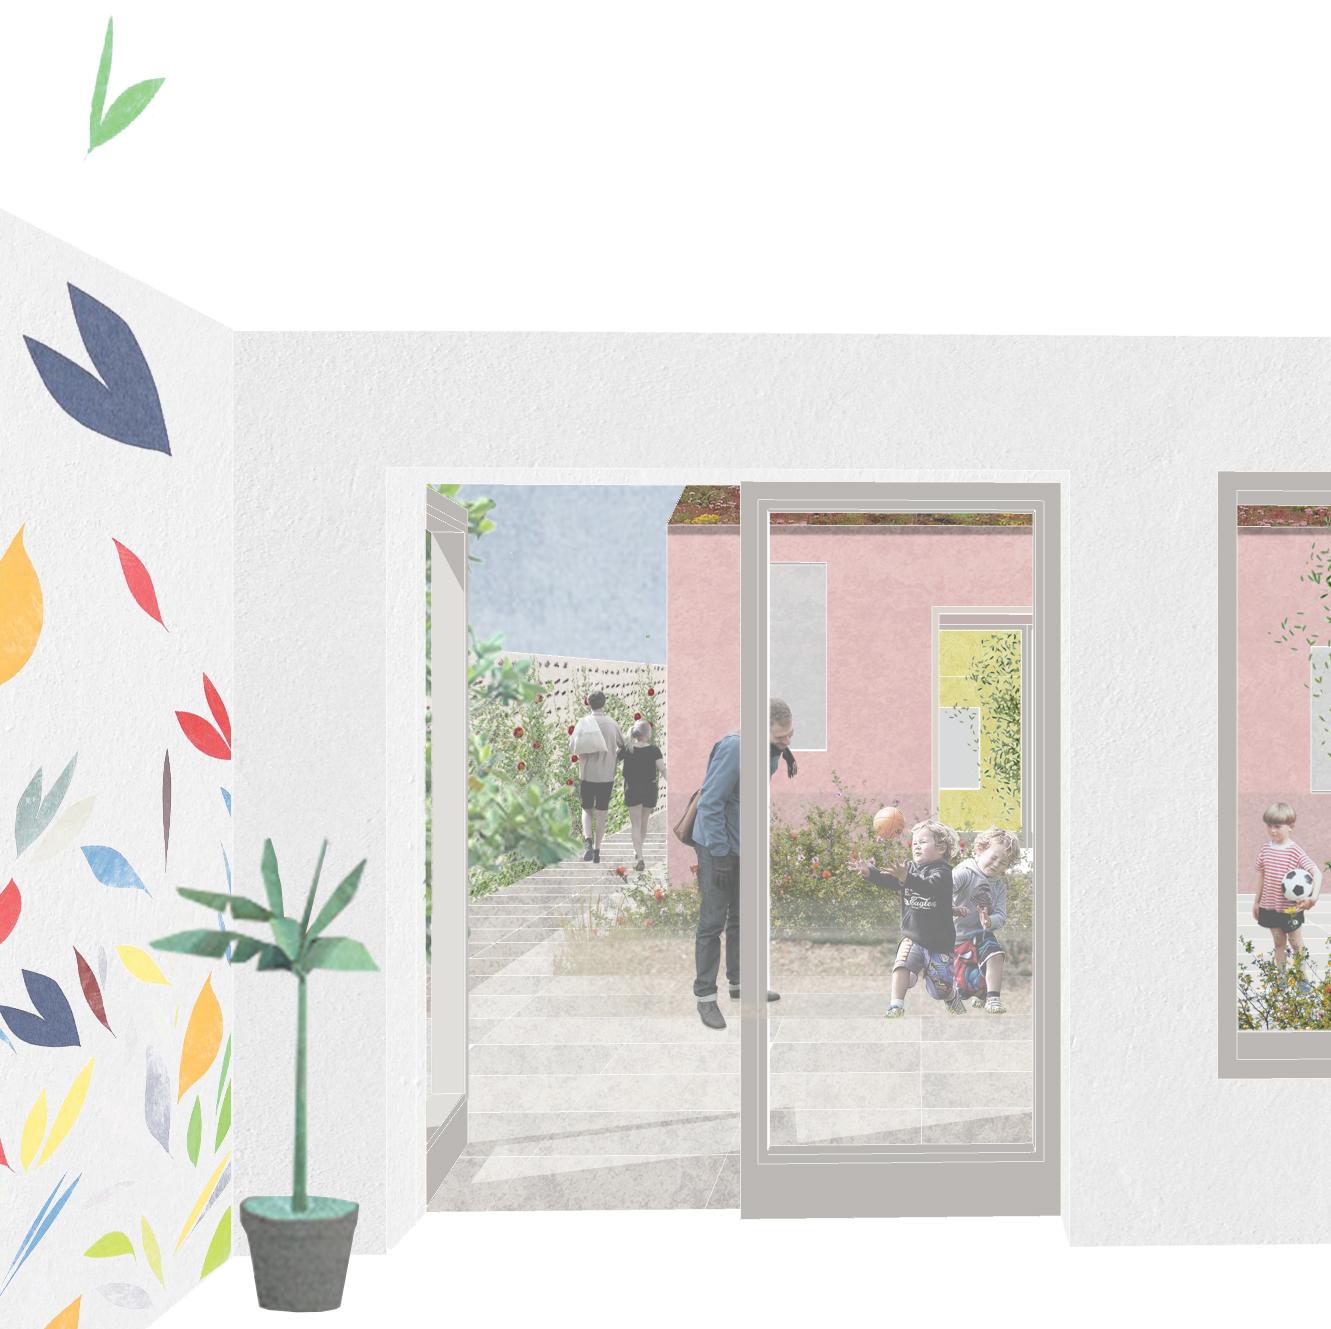 Terrace House 2-crop.jpg